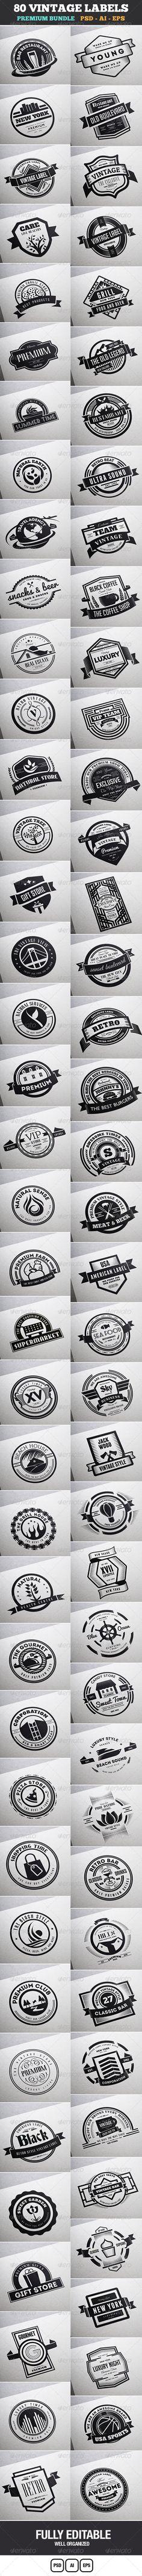 80 Vintage Labels & Badges Logos Bundle - Badges & Stickers Web Elements